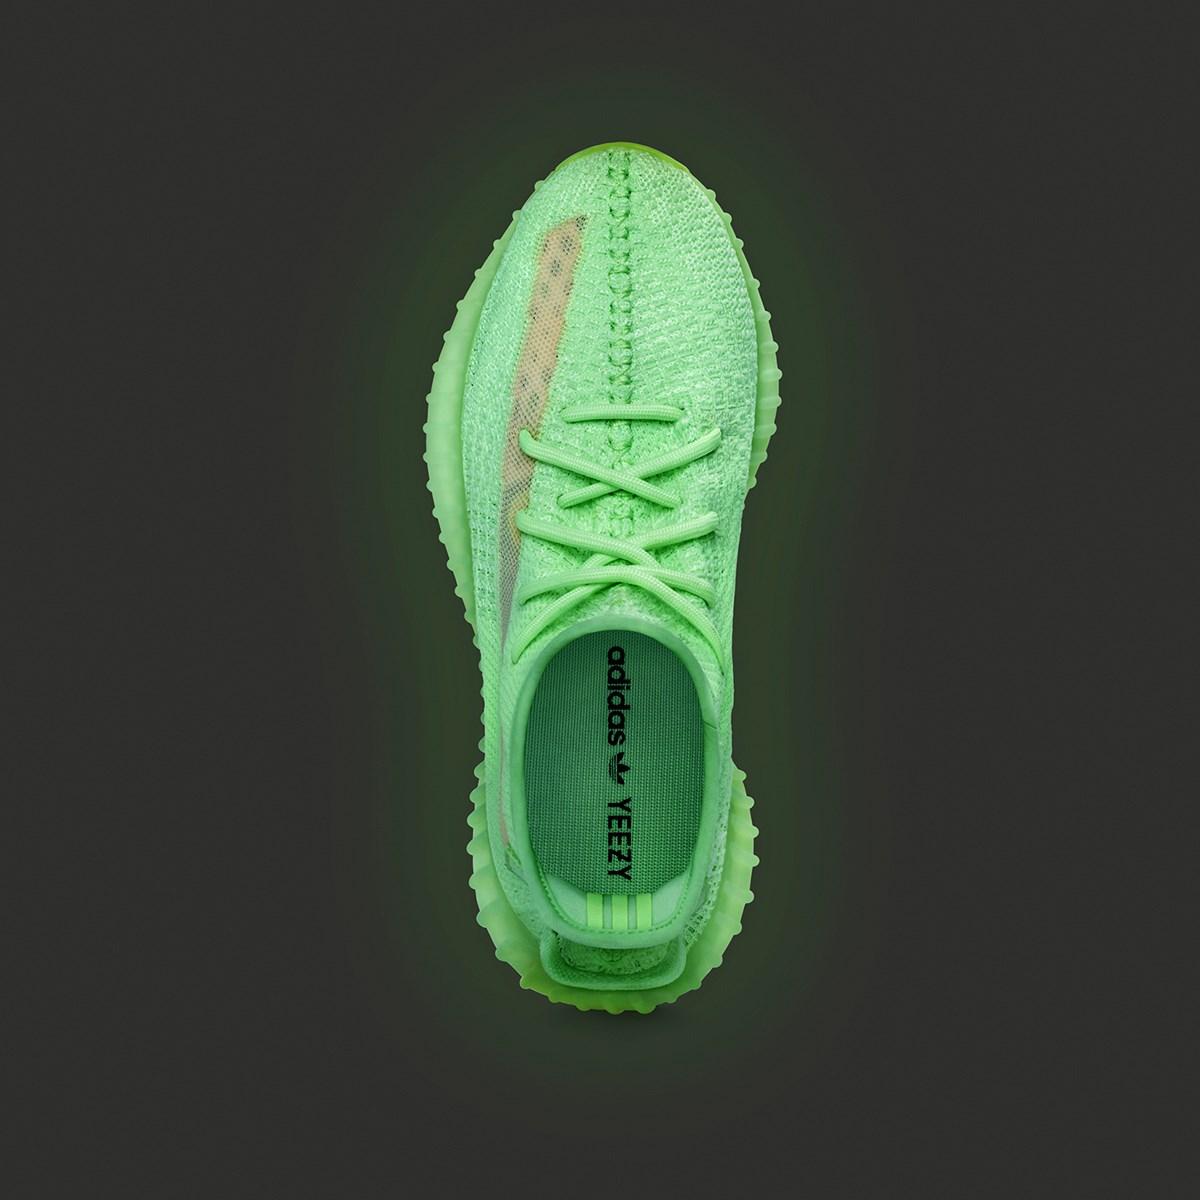 adidas Yeezy Boost 350 V2 GID - Eg5293